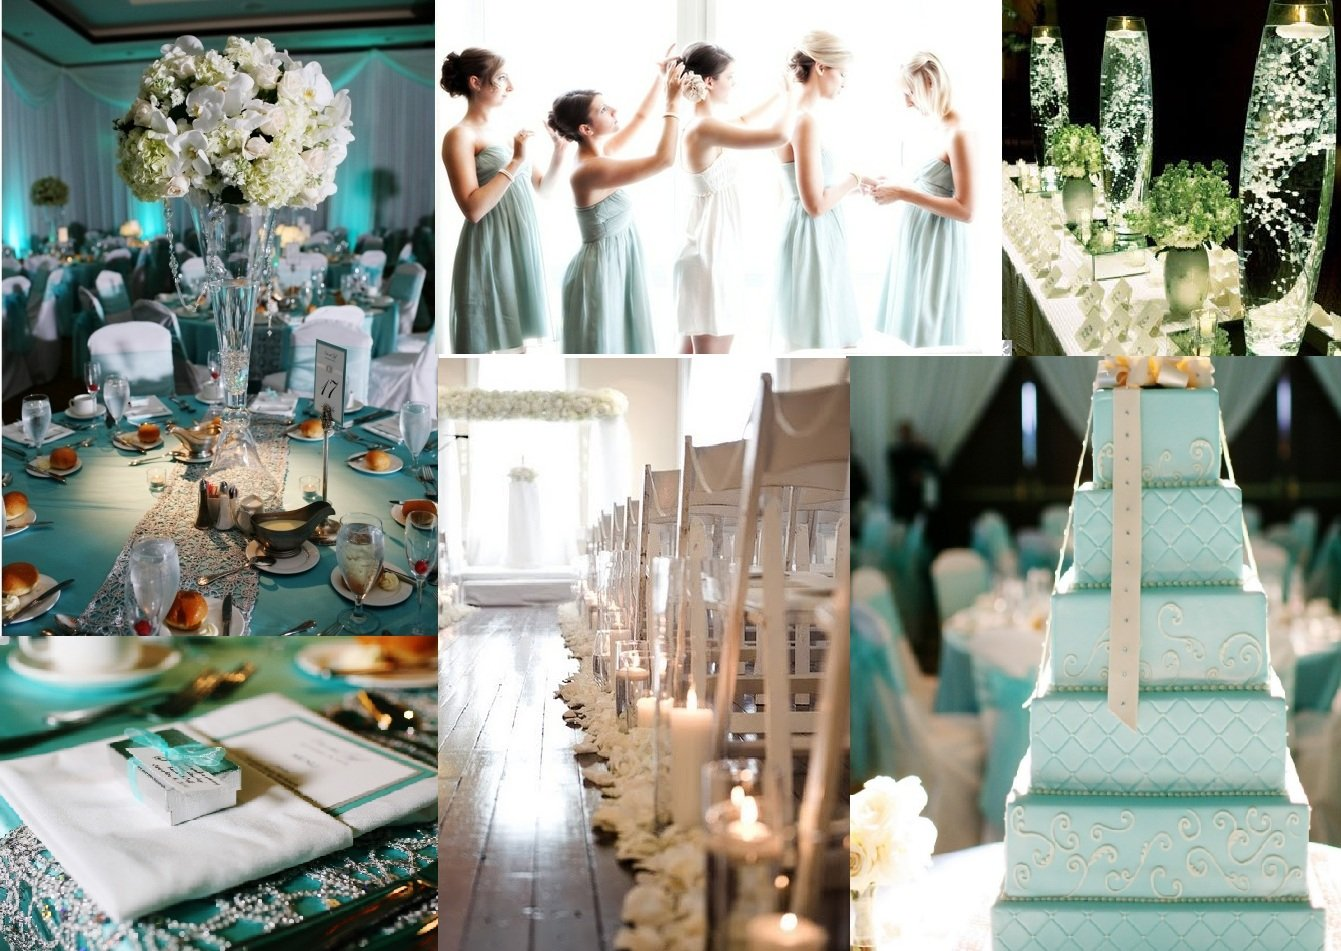 Photo Credit:   savethedateevents.com, stylemepretty.com,  gallery.weddingbee.com, valleyandco.blogspot.com,